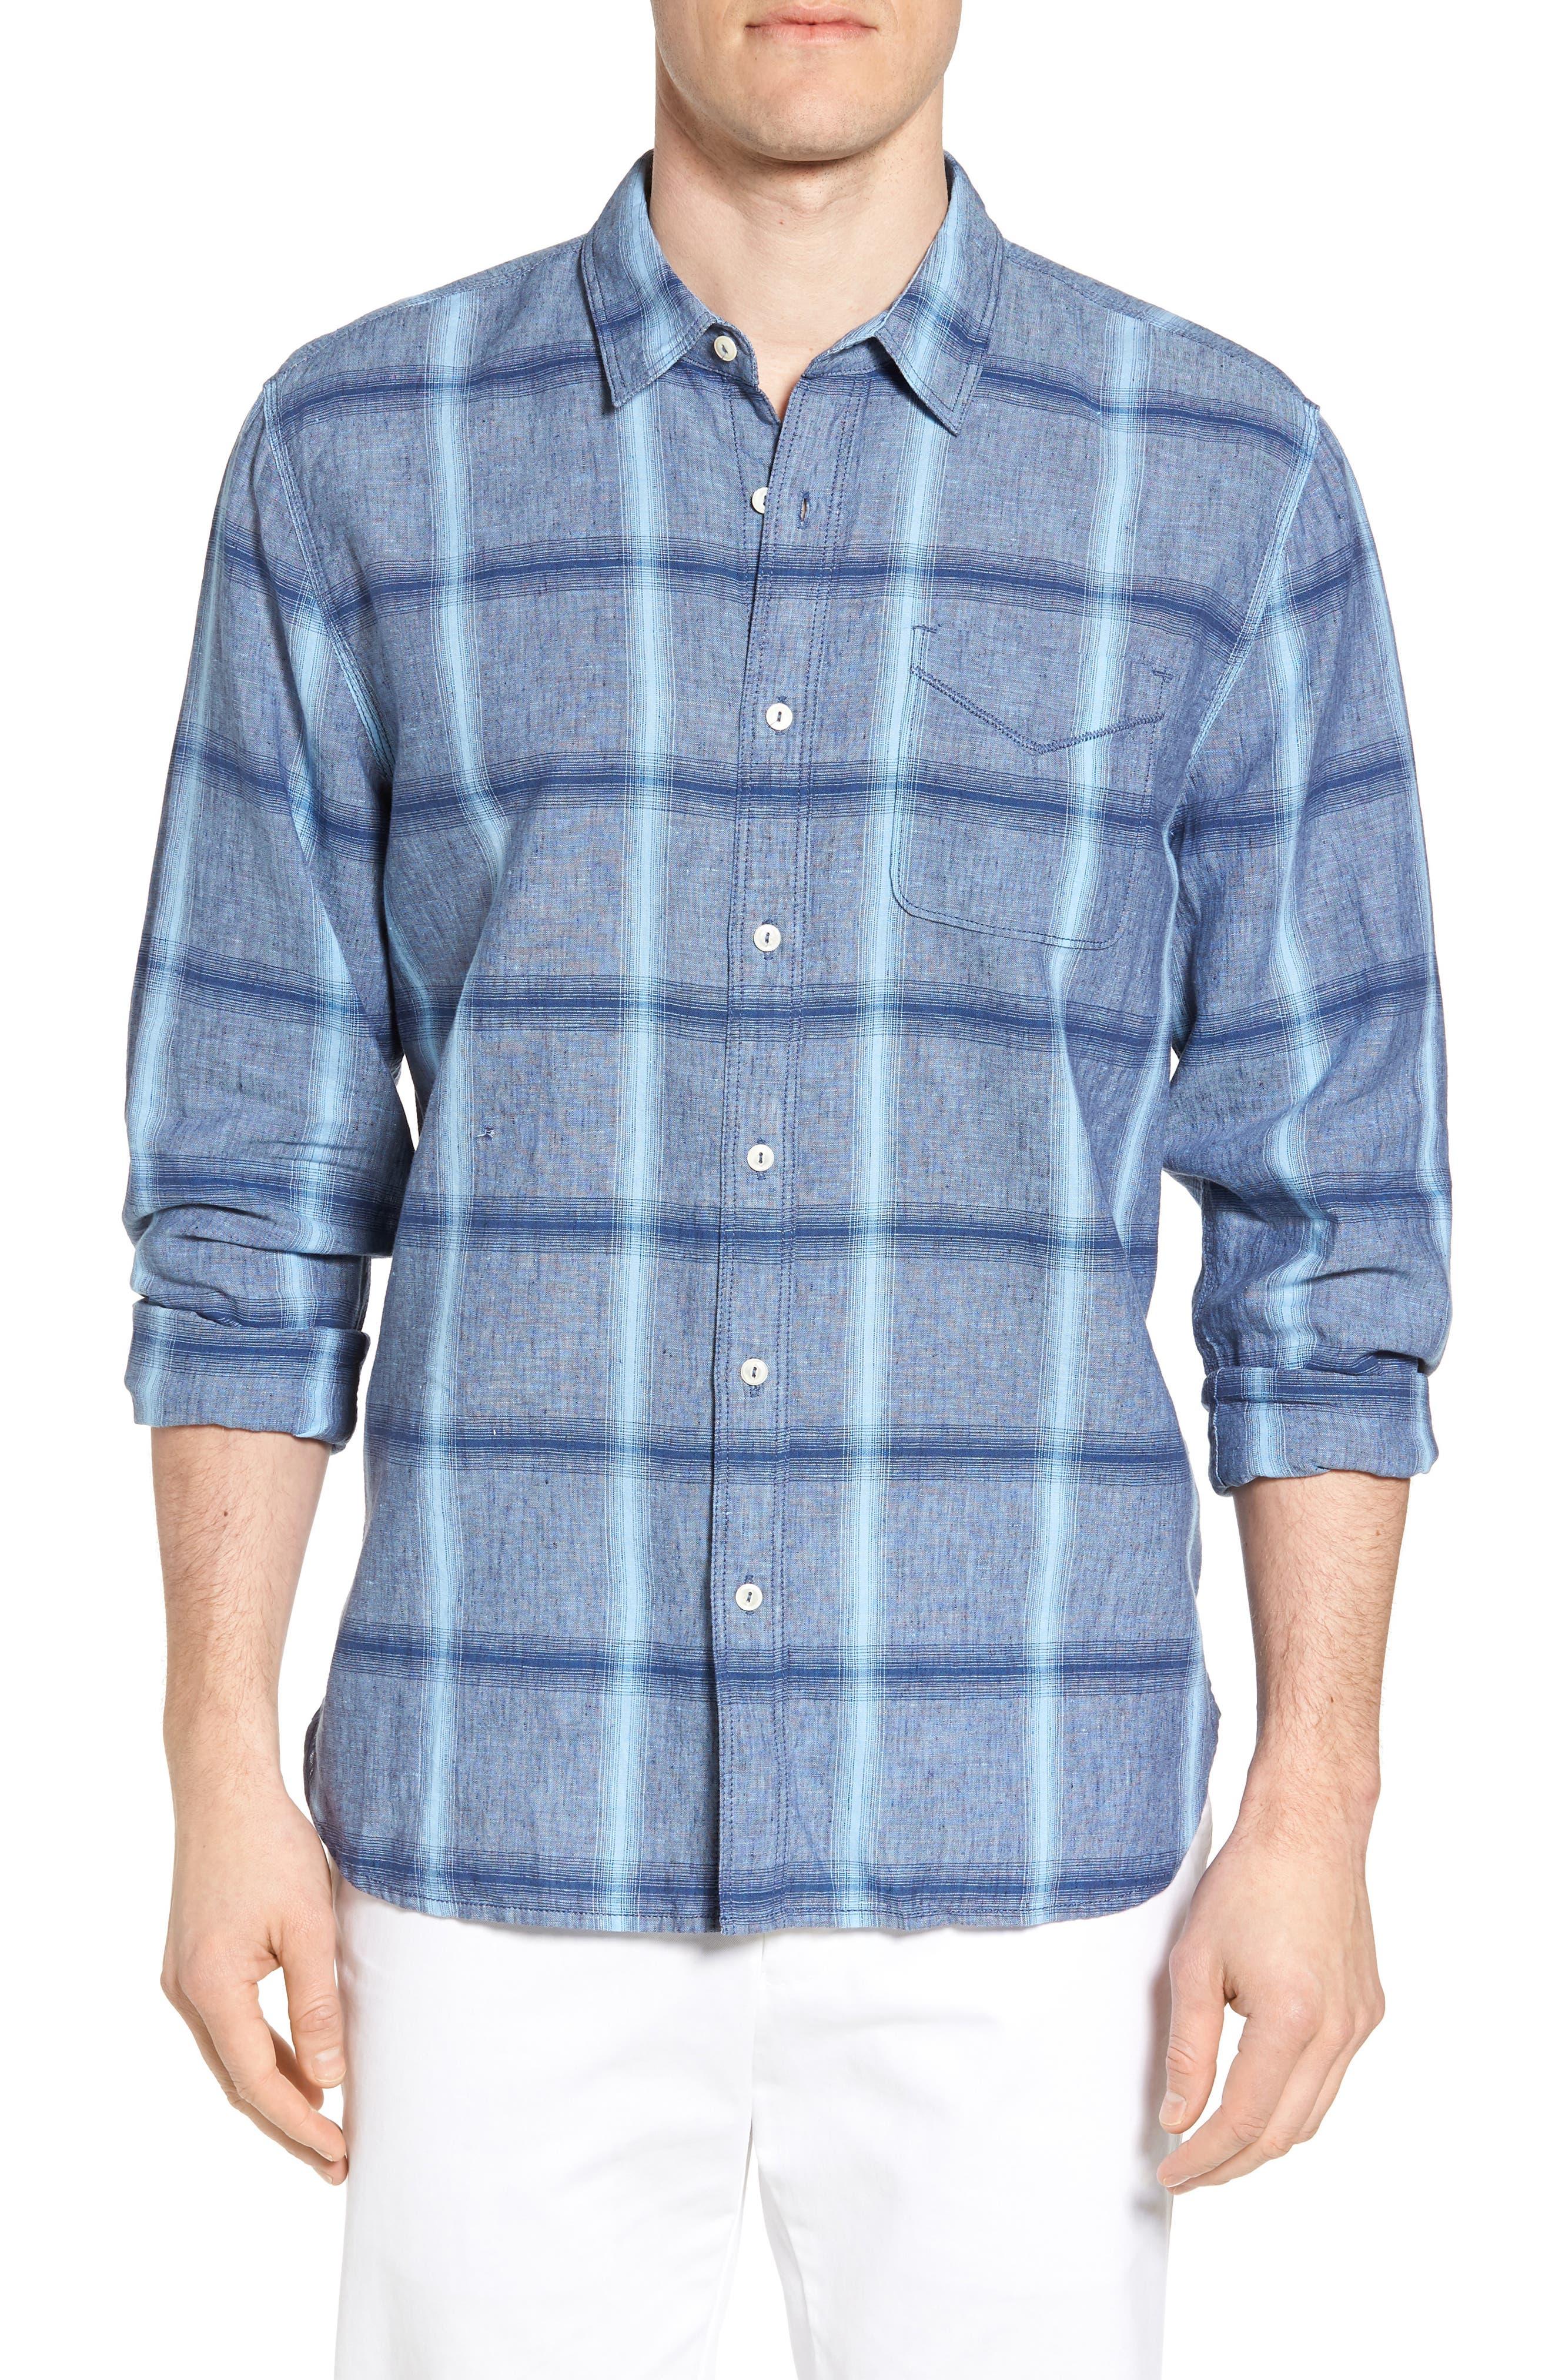 Main Image - True Grit Rincon Plaid Linen Blend Chambray Sport Shirt